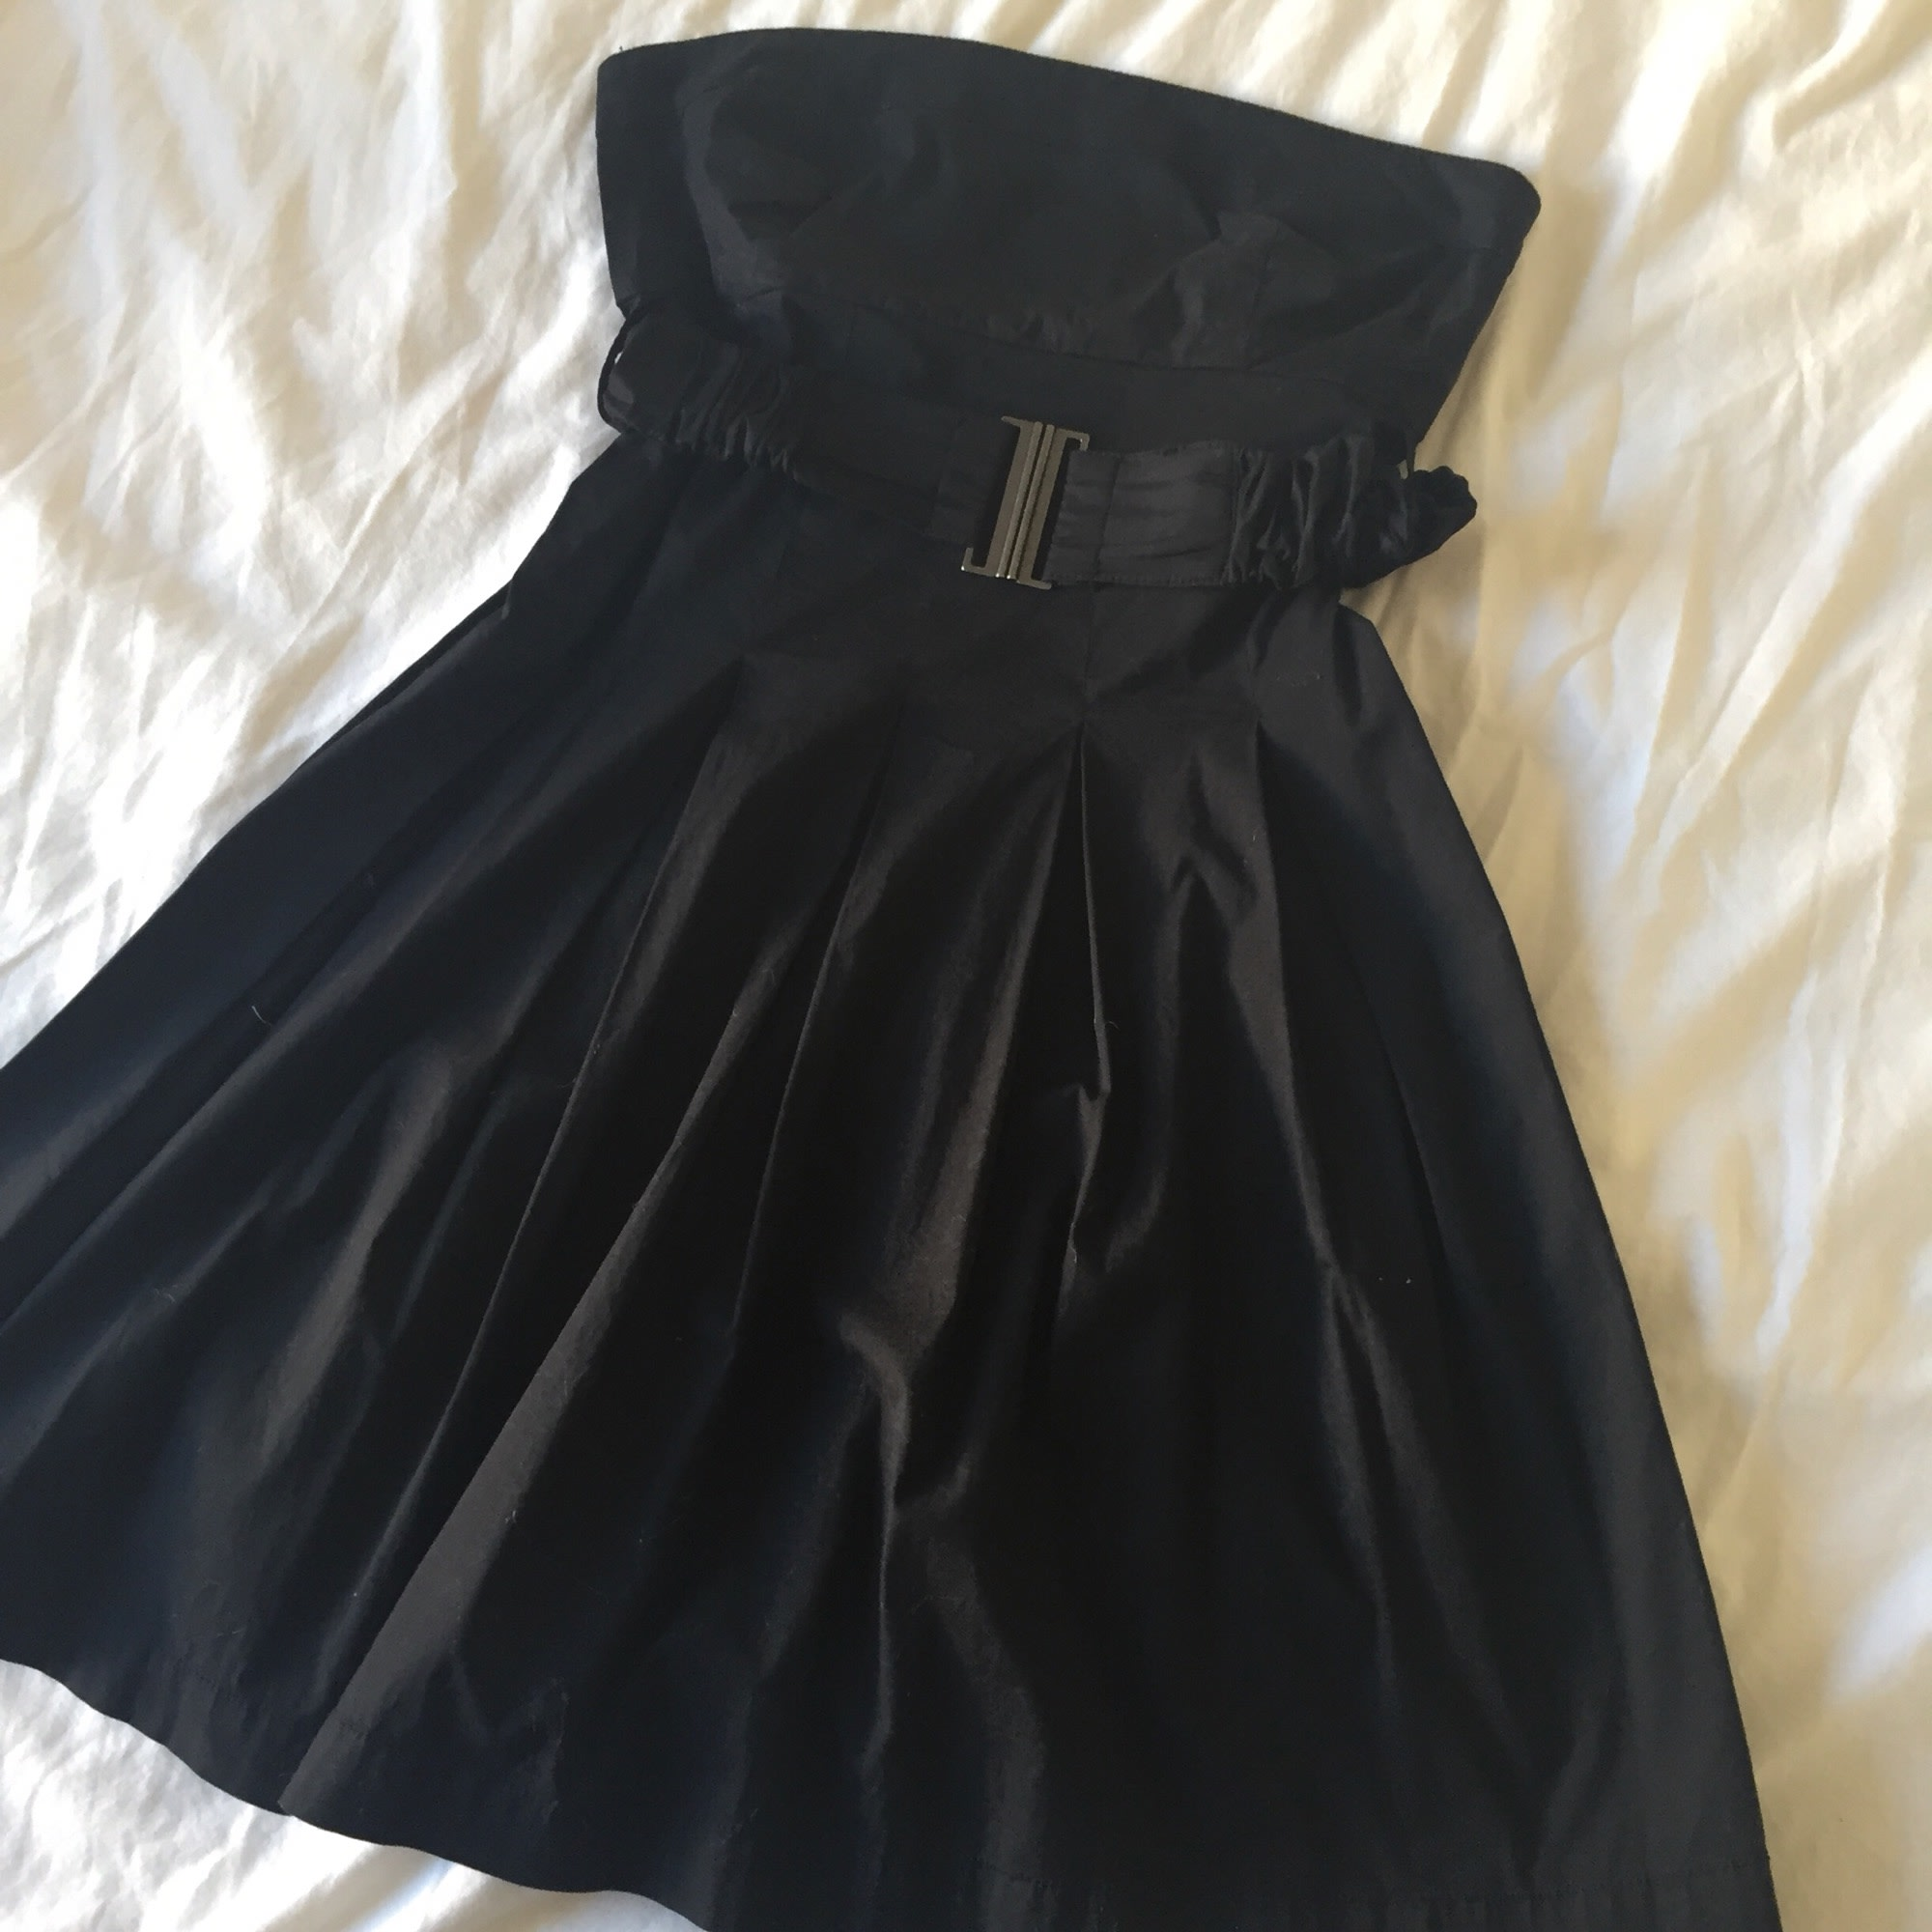 8d370fa72e7e Robe Bustier Noir Mango 2151673 T4 lxl Vendu 42 Par Nessa qA1HxPq